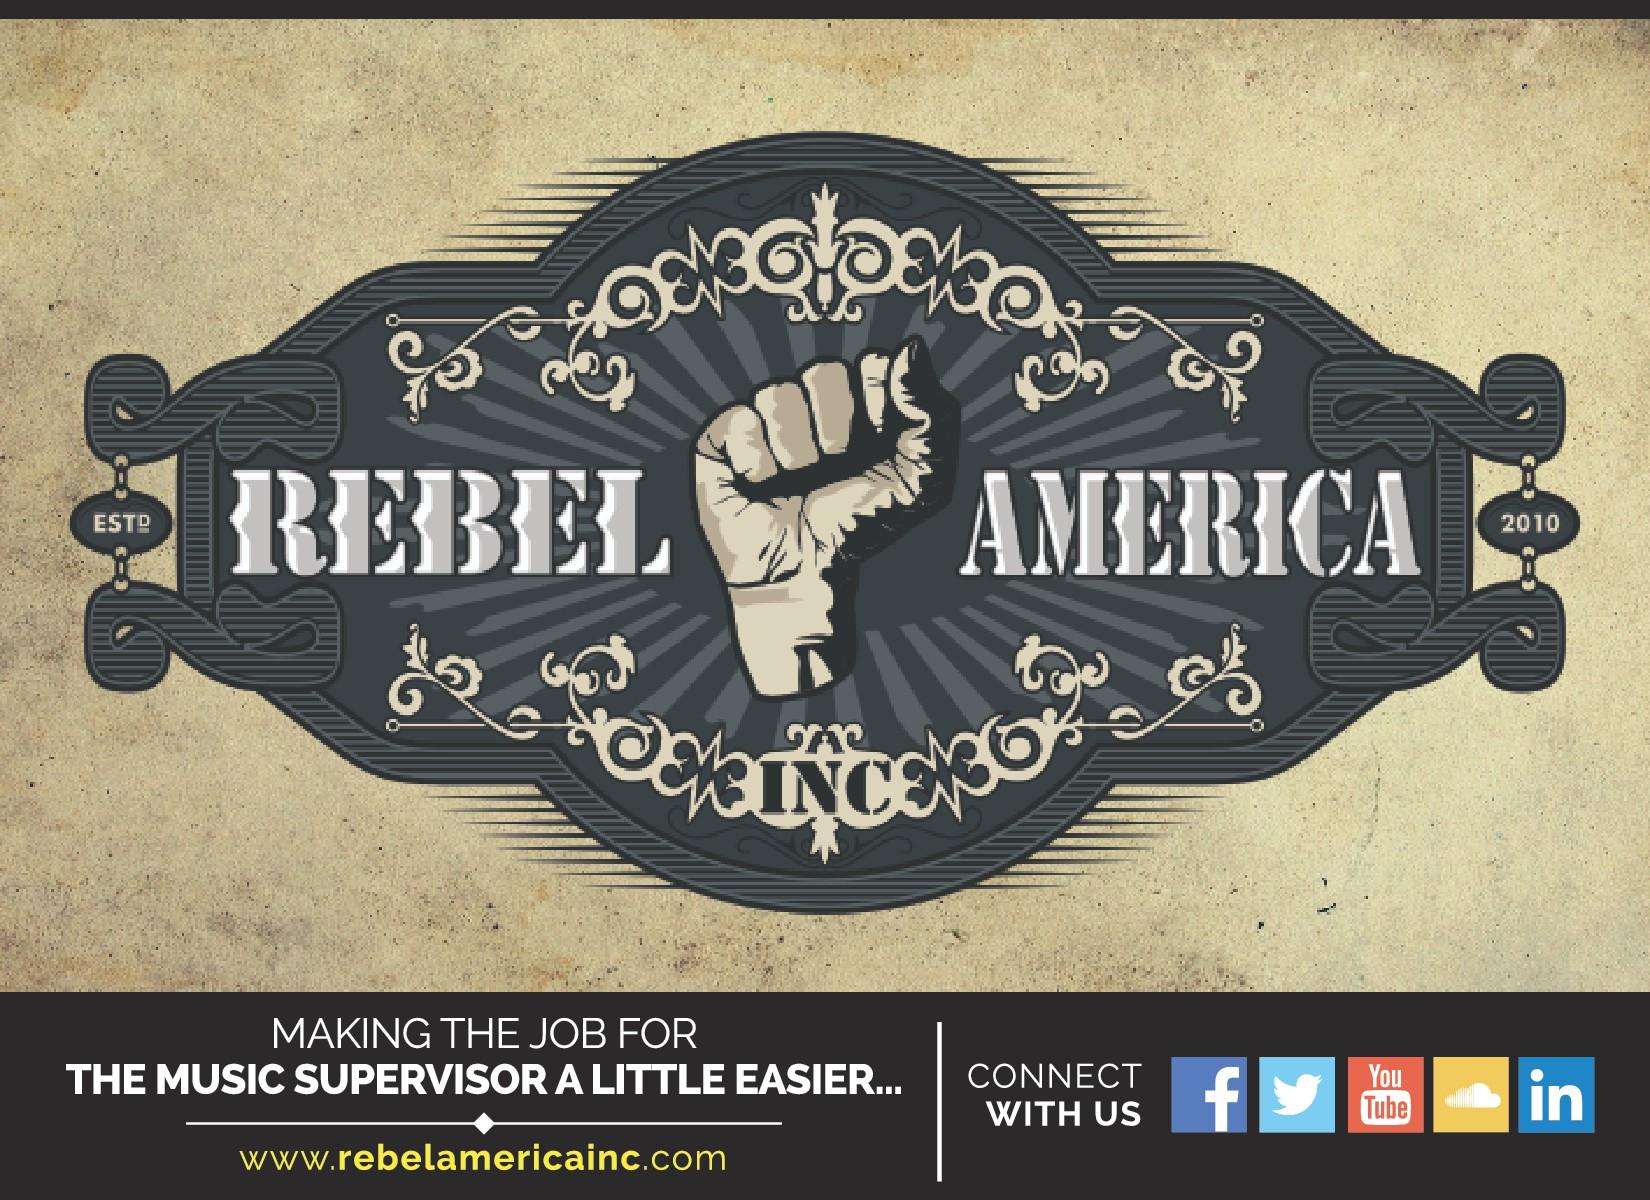 Modern Fun Attractive Flyer - Rebel America Inc